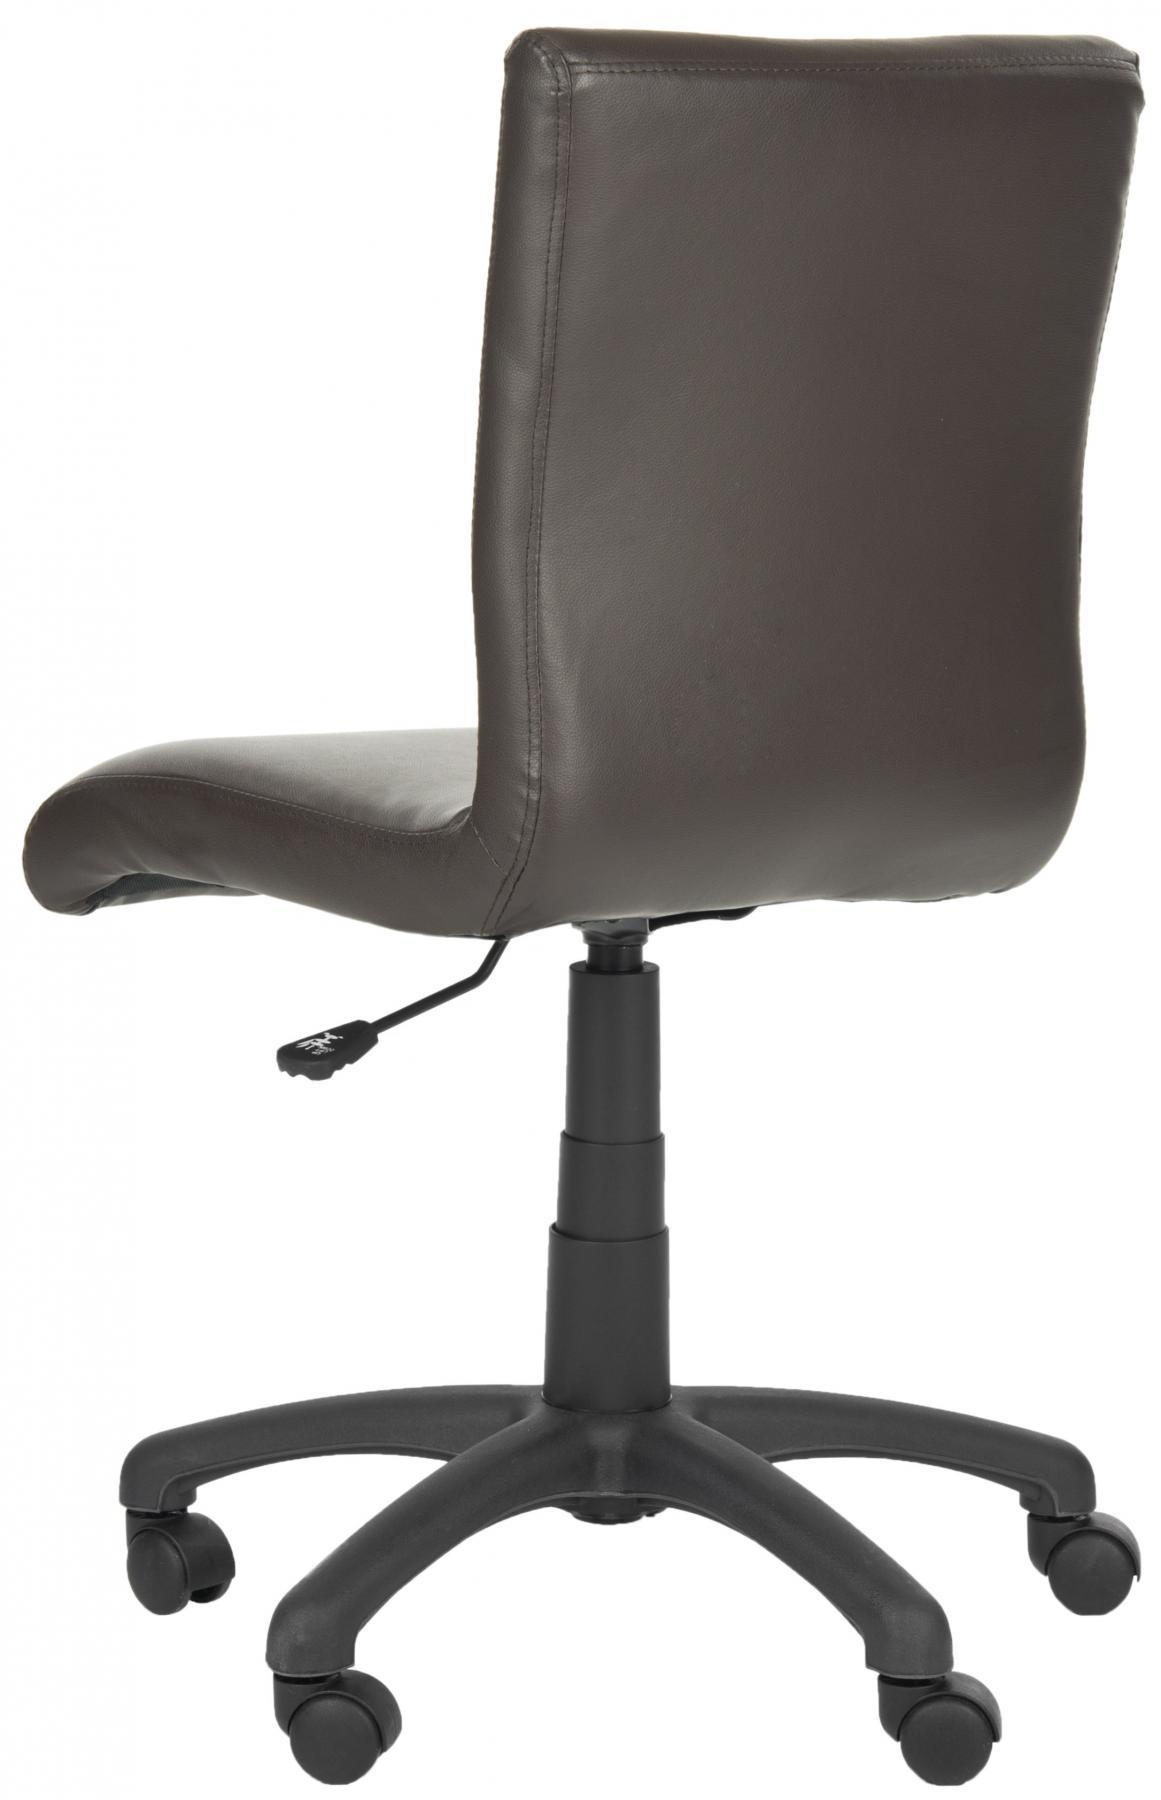 safavieh fox8501a brown armless desk chair 261 00 desk chairs rh nyfifth com armless desk chairs without wheels armless desk chairs leather